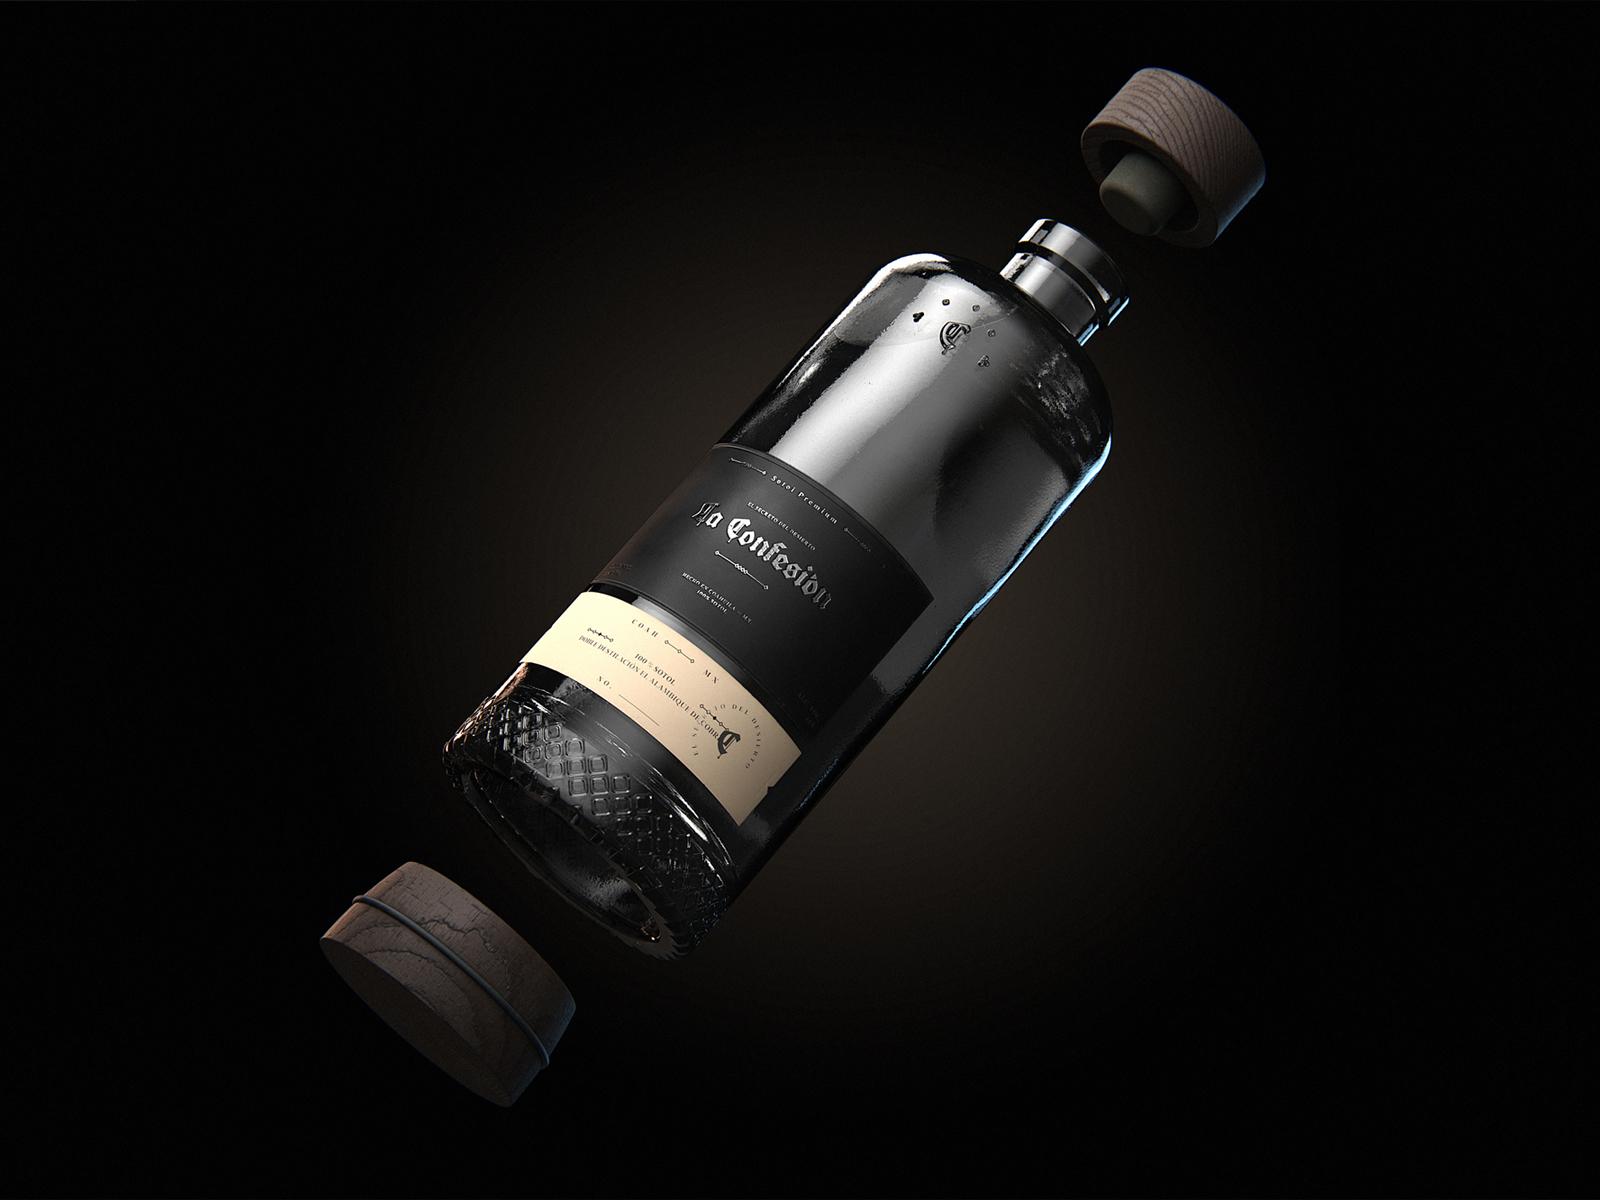 Bottle and Branding Design for La Confesión Premium Sotol